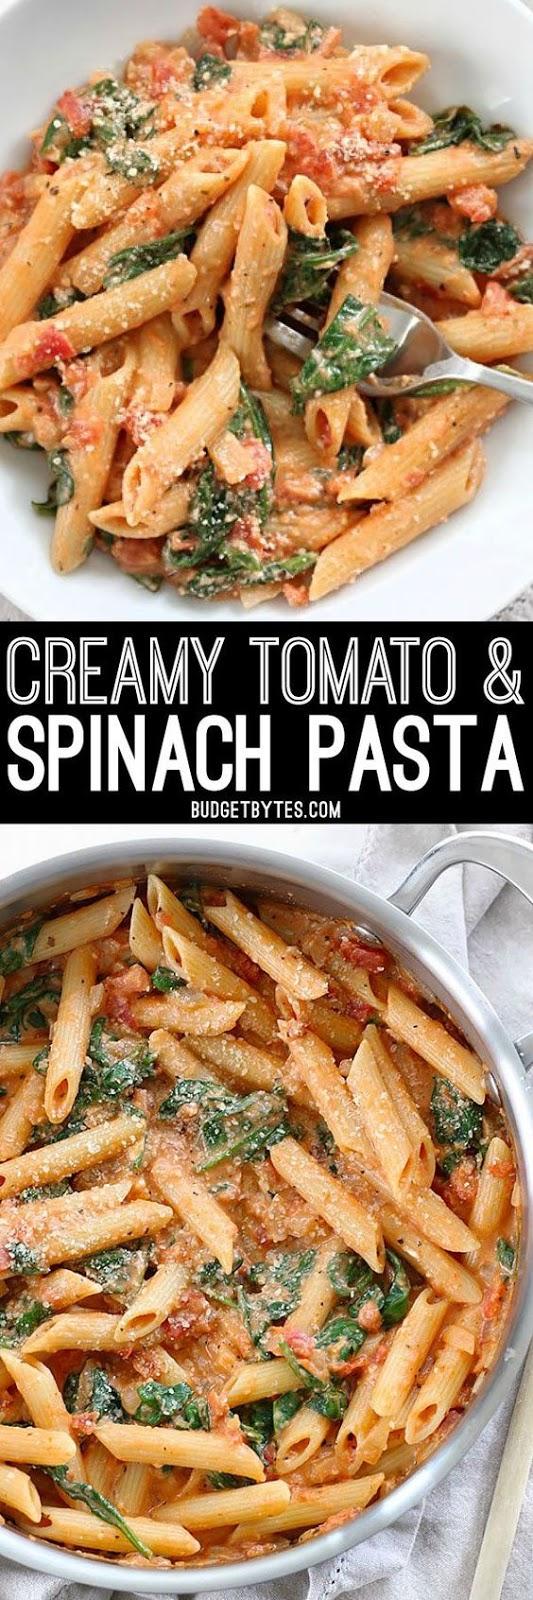 #Creamy #Tomato And #Spínach #Pasta #VIDEO #Dinner #easyrecipe